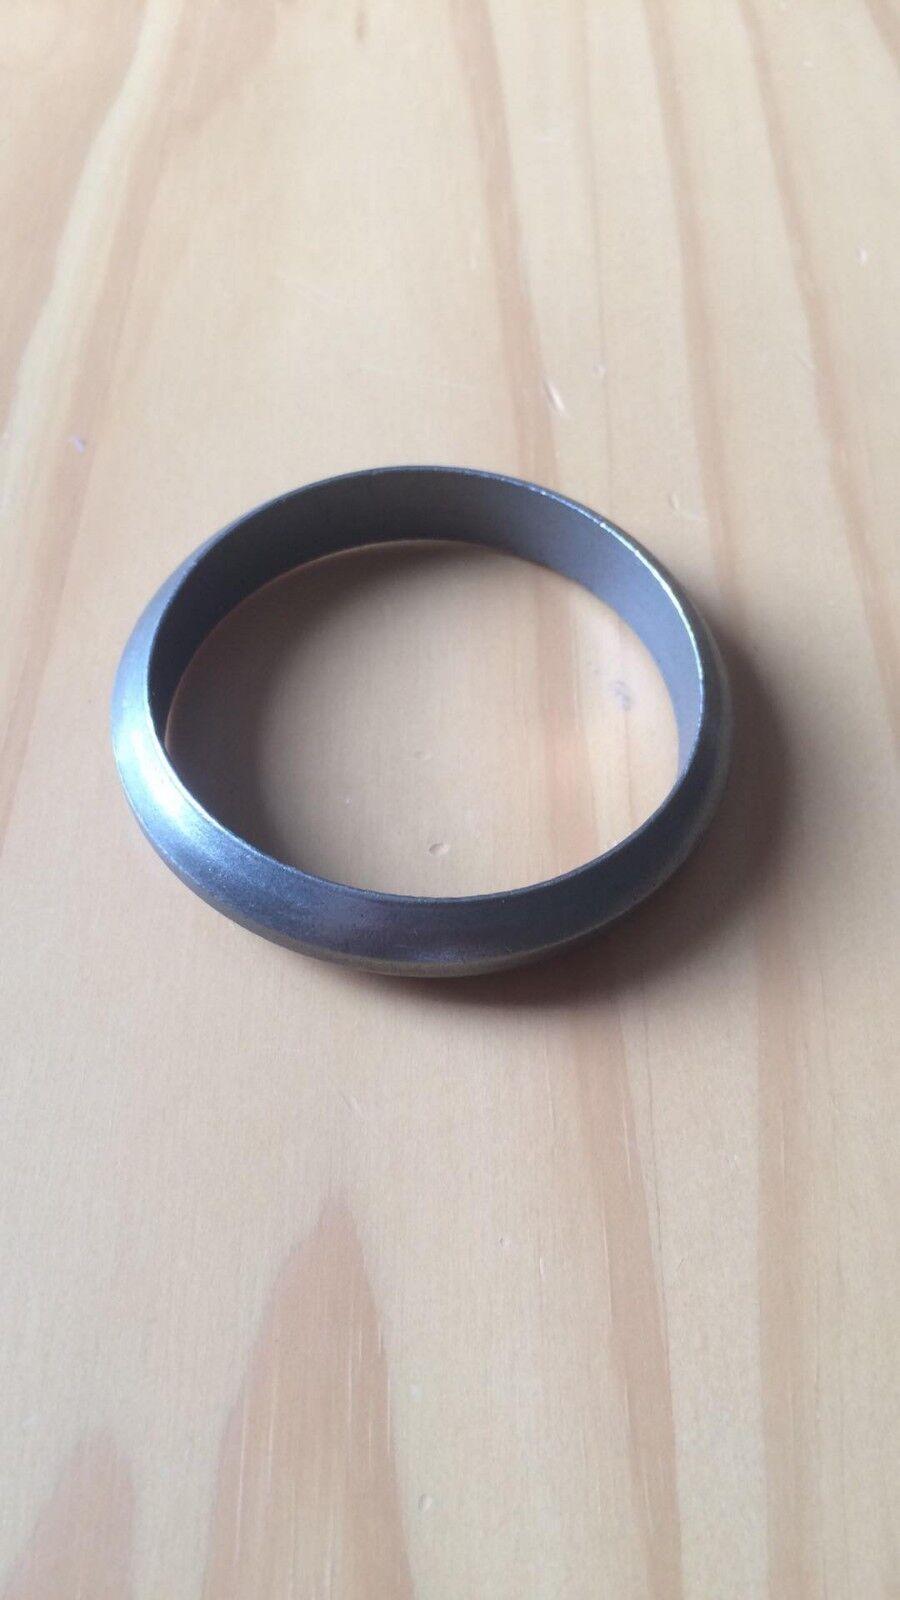 SBG5 Klarius Ring Gasket